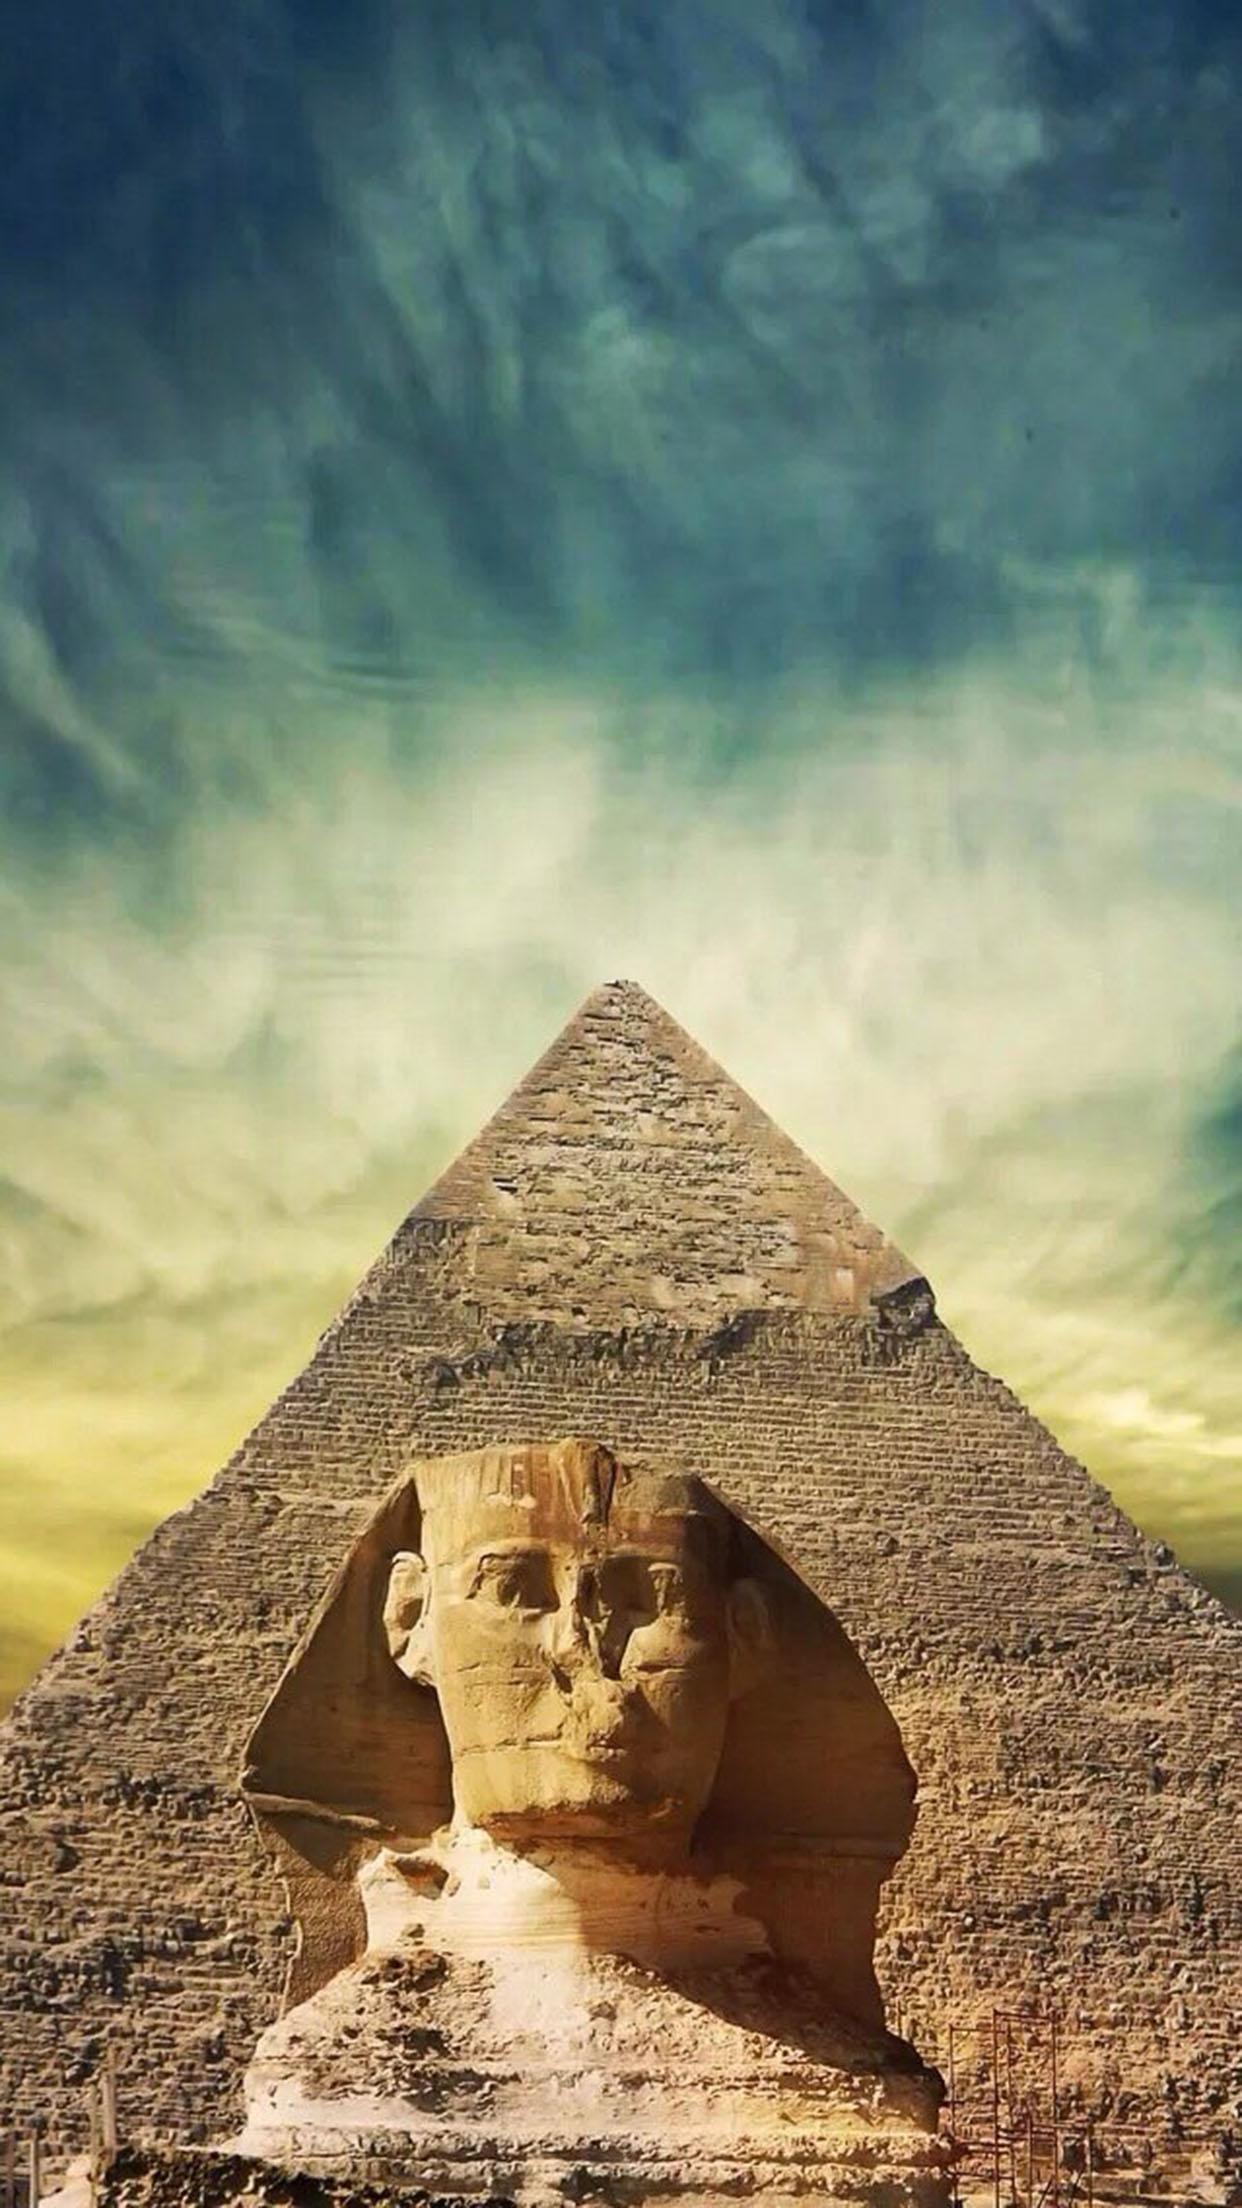 Pyramide Pyramide 1 3Wallpapers iPhone Parallax Pyramide 1